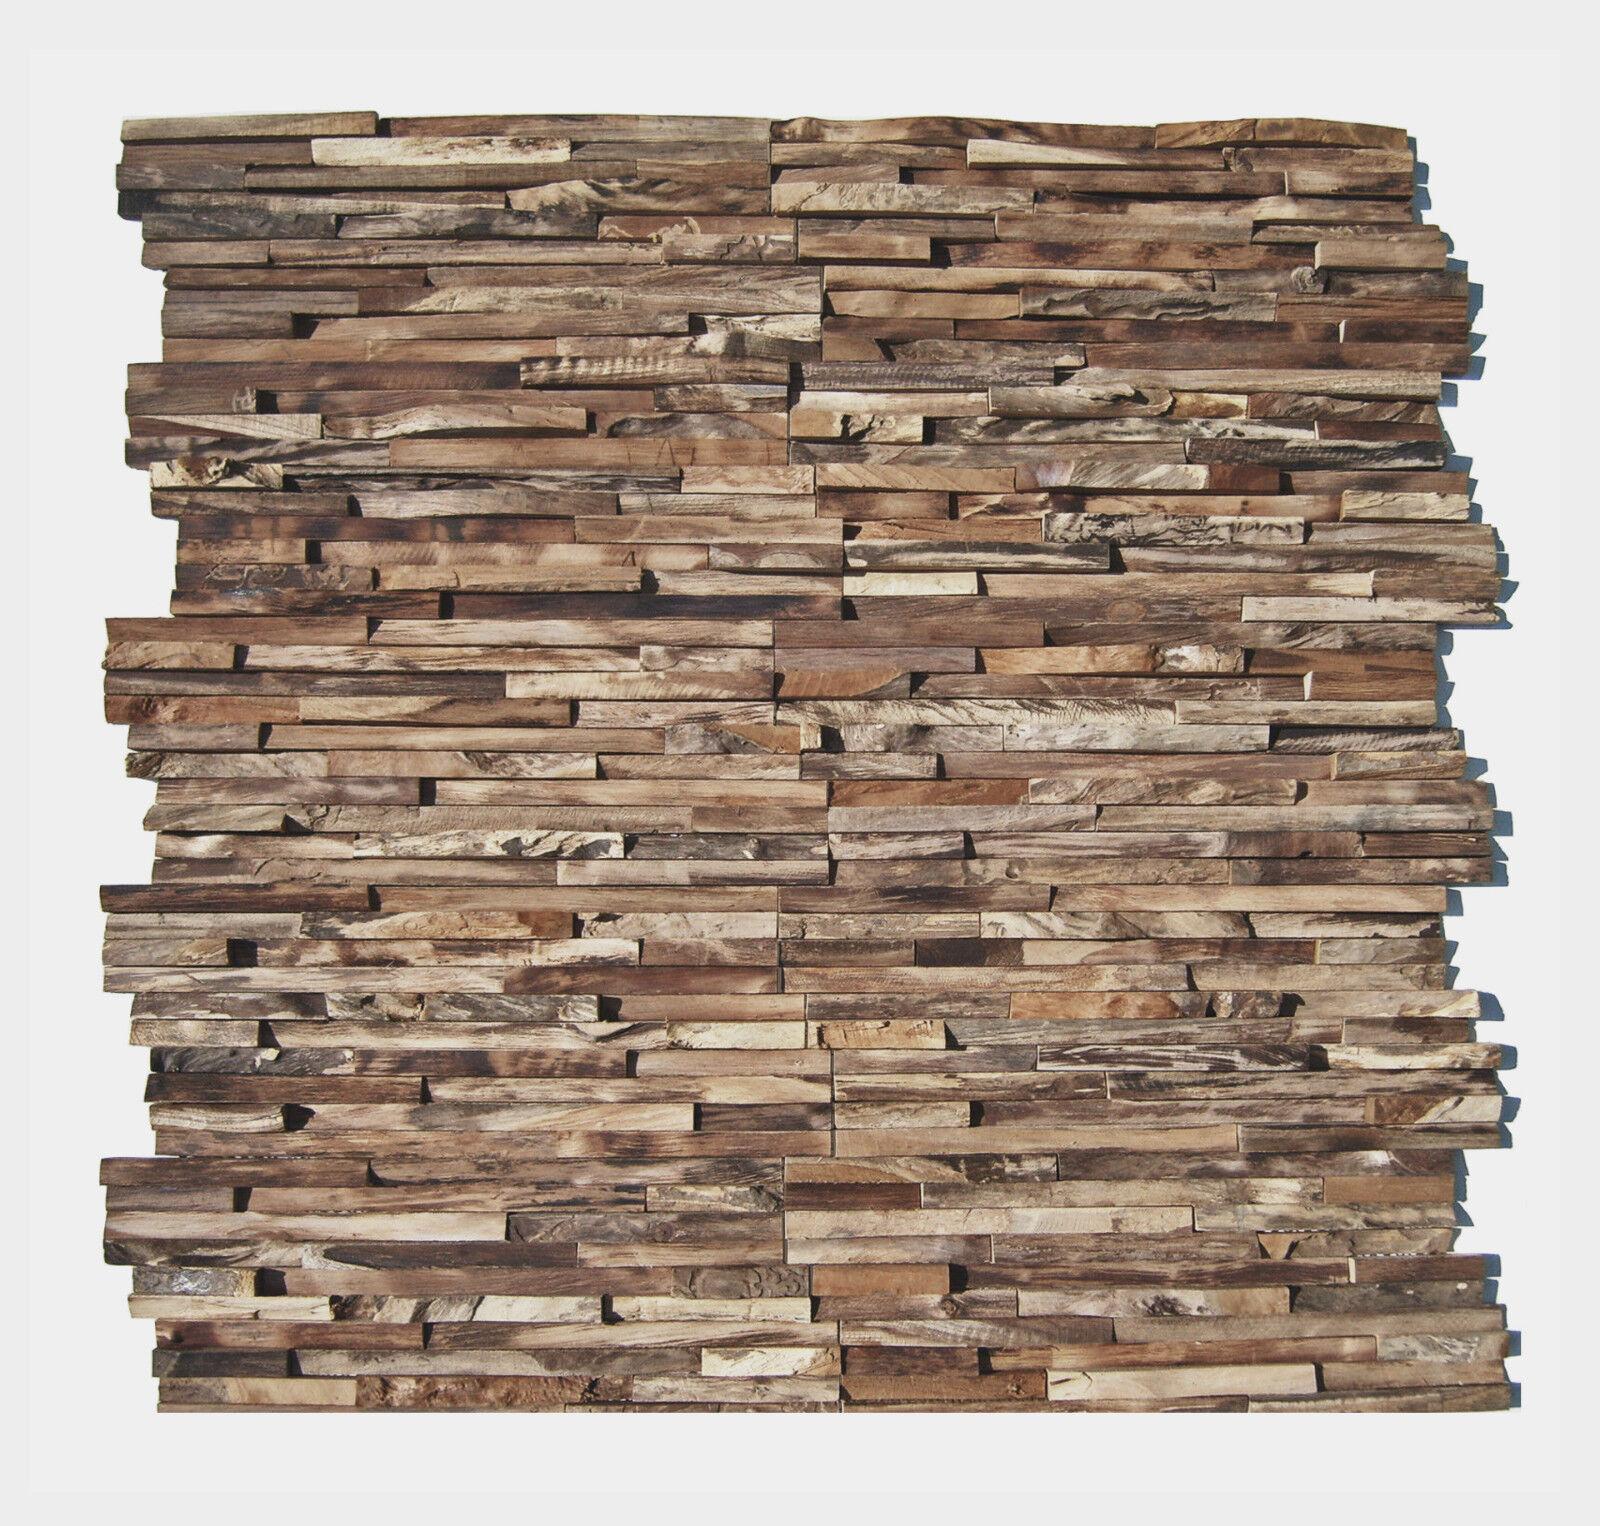 1 qm HO-006 Teakholz - Wand-Design Holz - Fliesen Lager Stein-mosaik NRW Herne